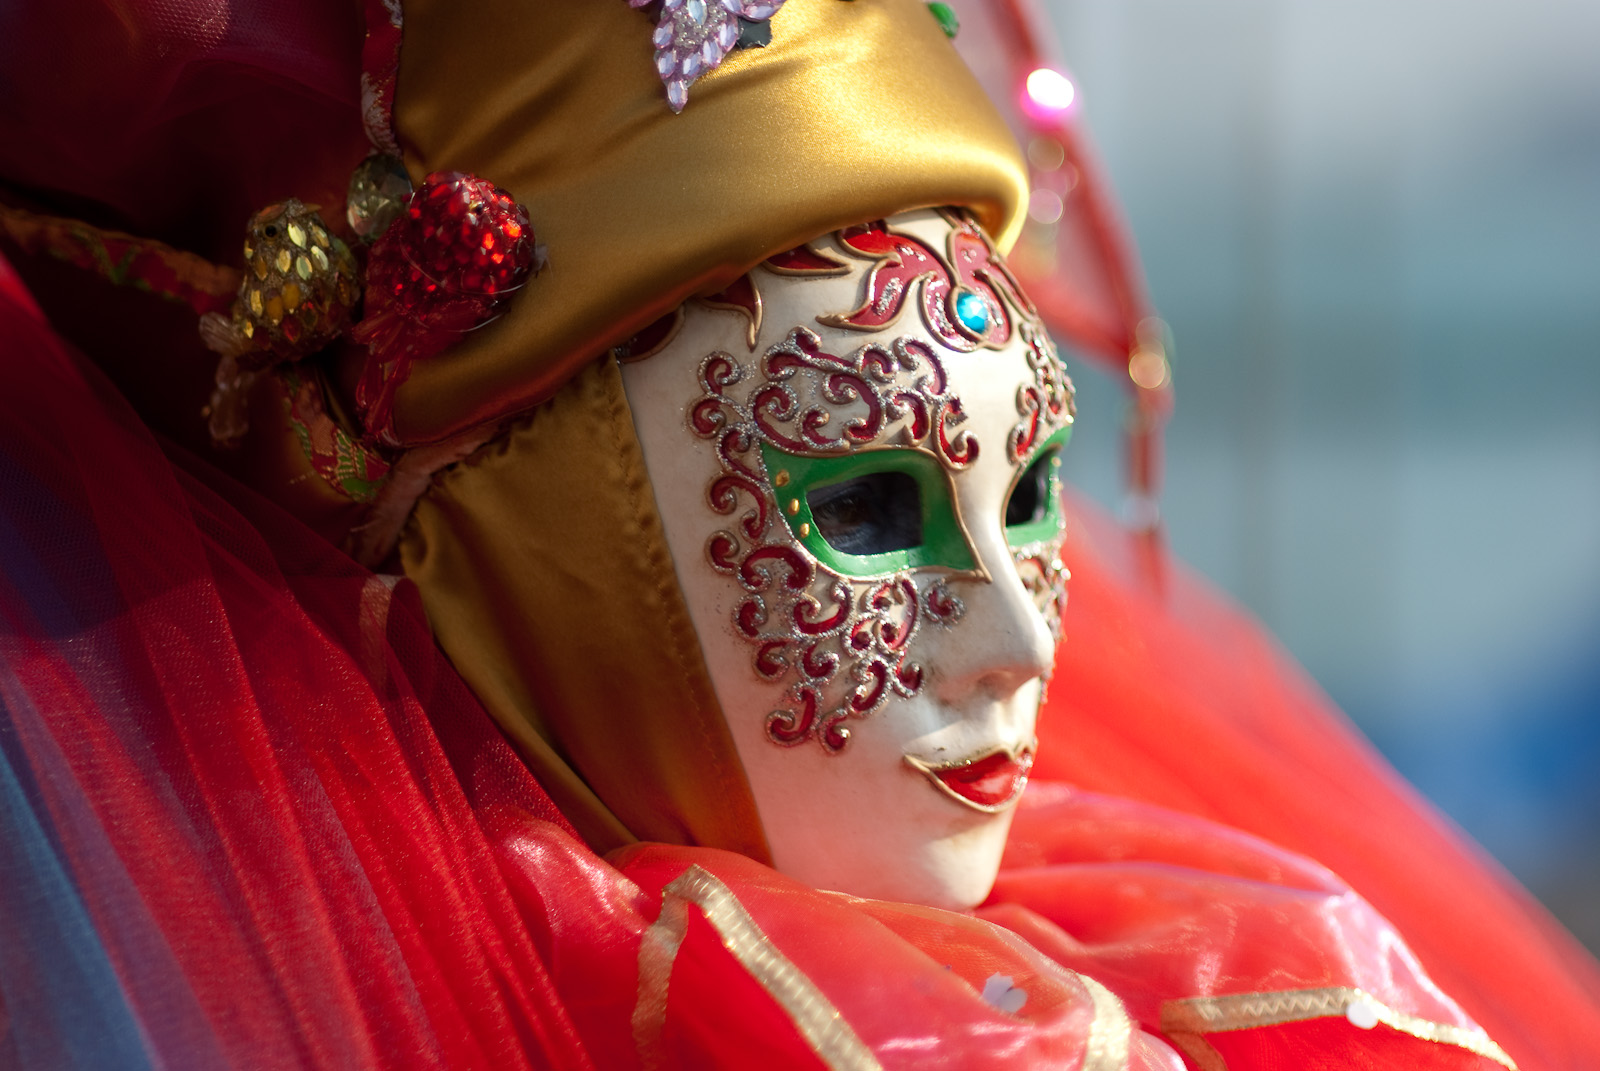 Carnevale di Venezia @ Markusplatz | Venedig | Venetien | Italien